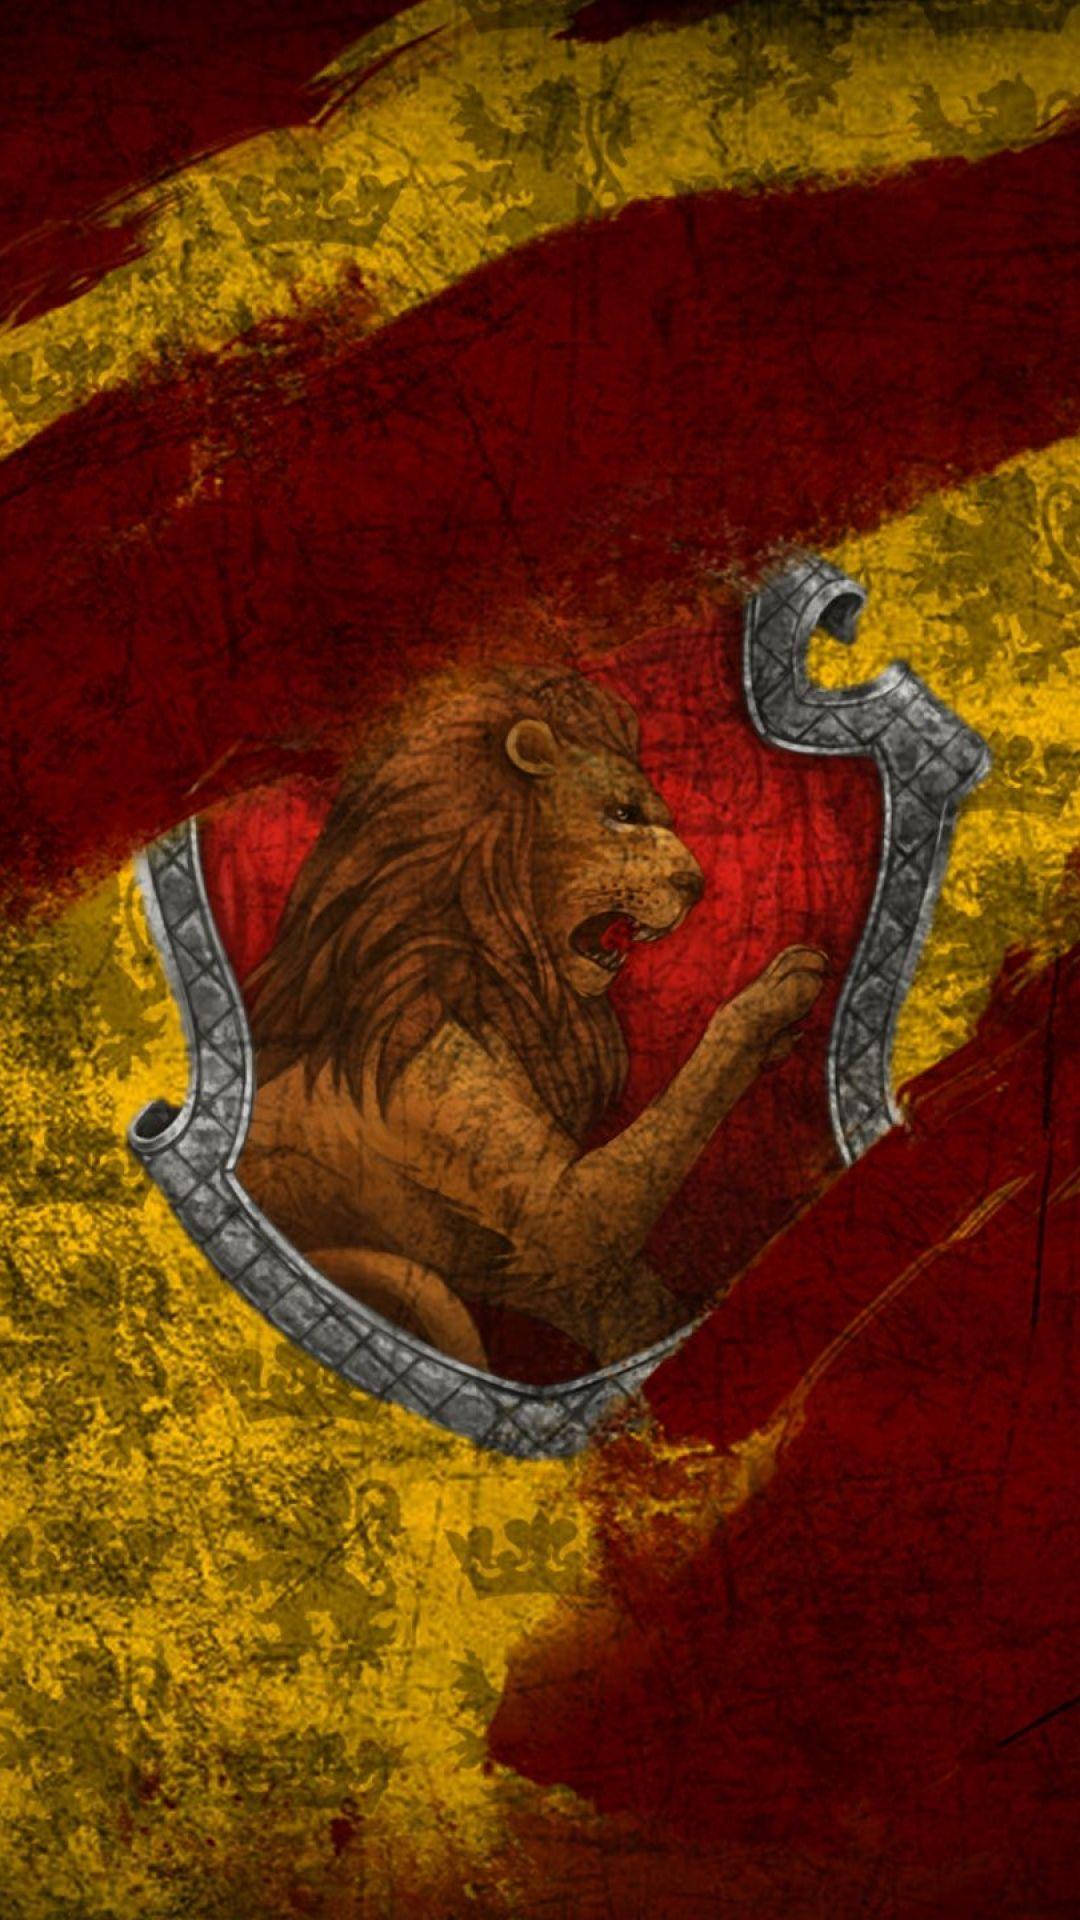 Harry Potter Gryffindor Iphone Wallpapers Top Free Harry Potter Gryffindor Iphone Backgrounds Wallpaperaccess